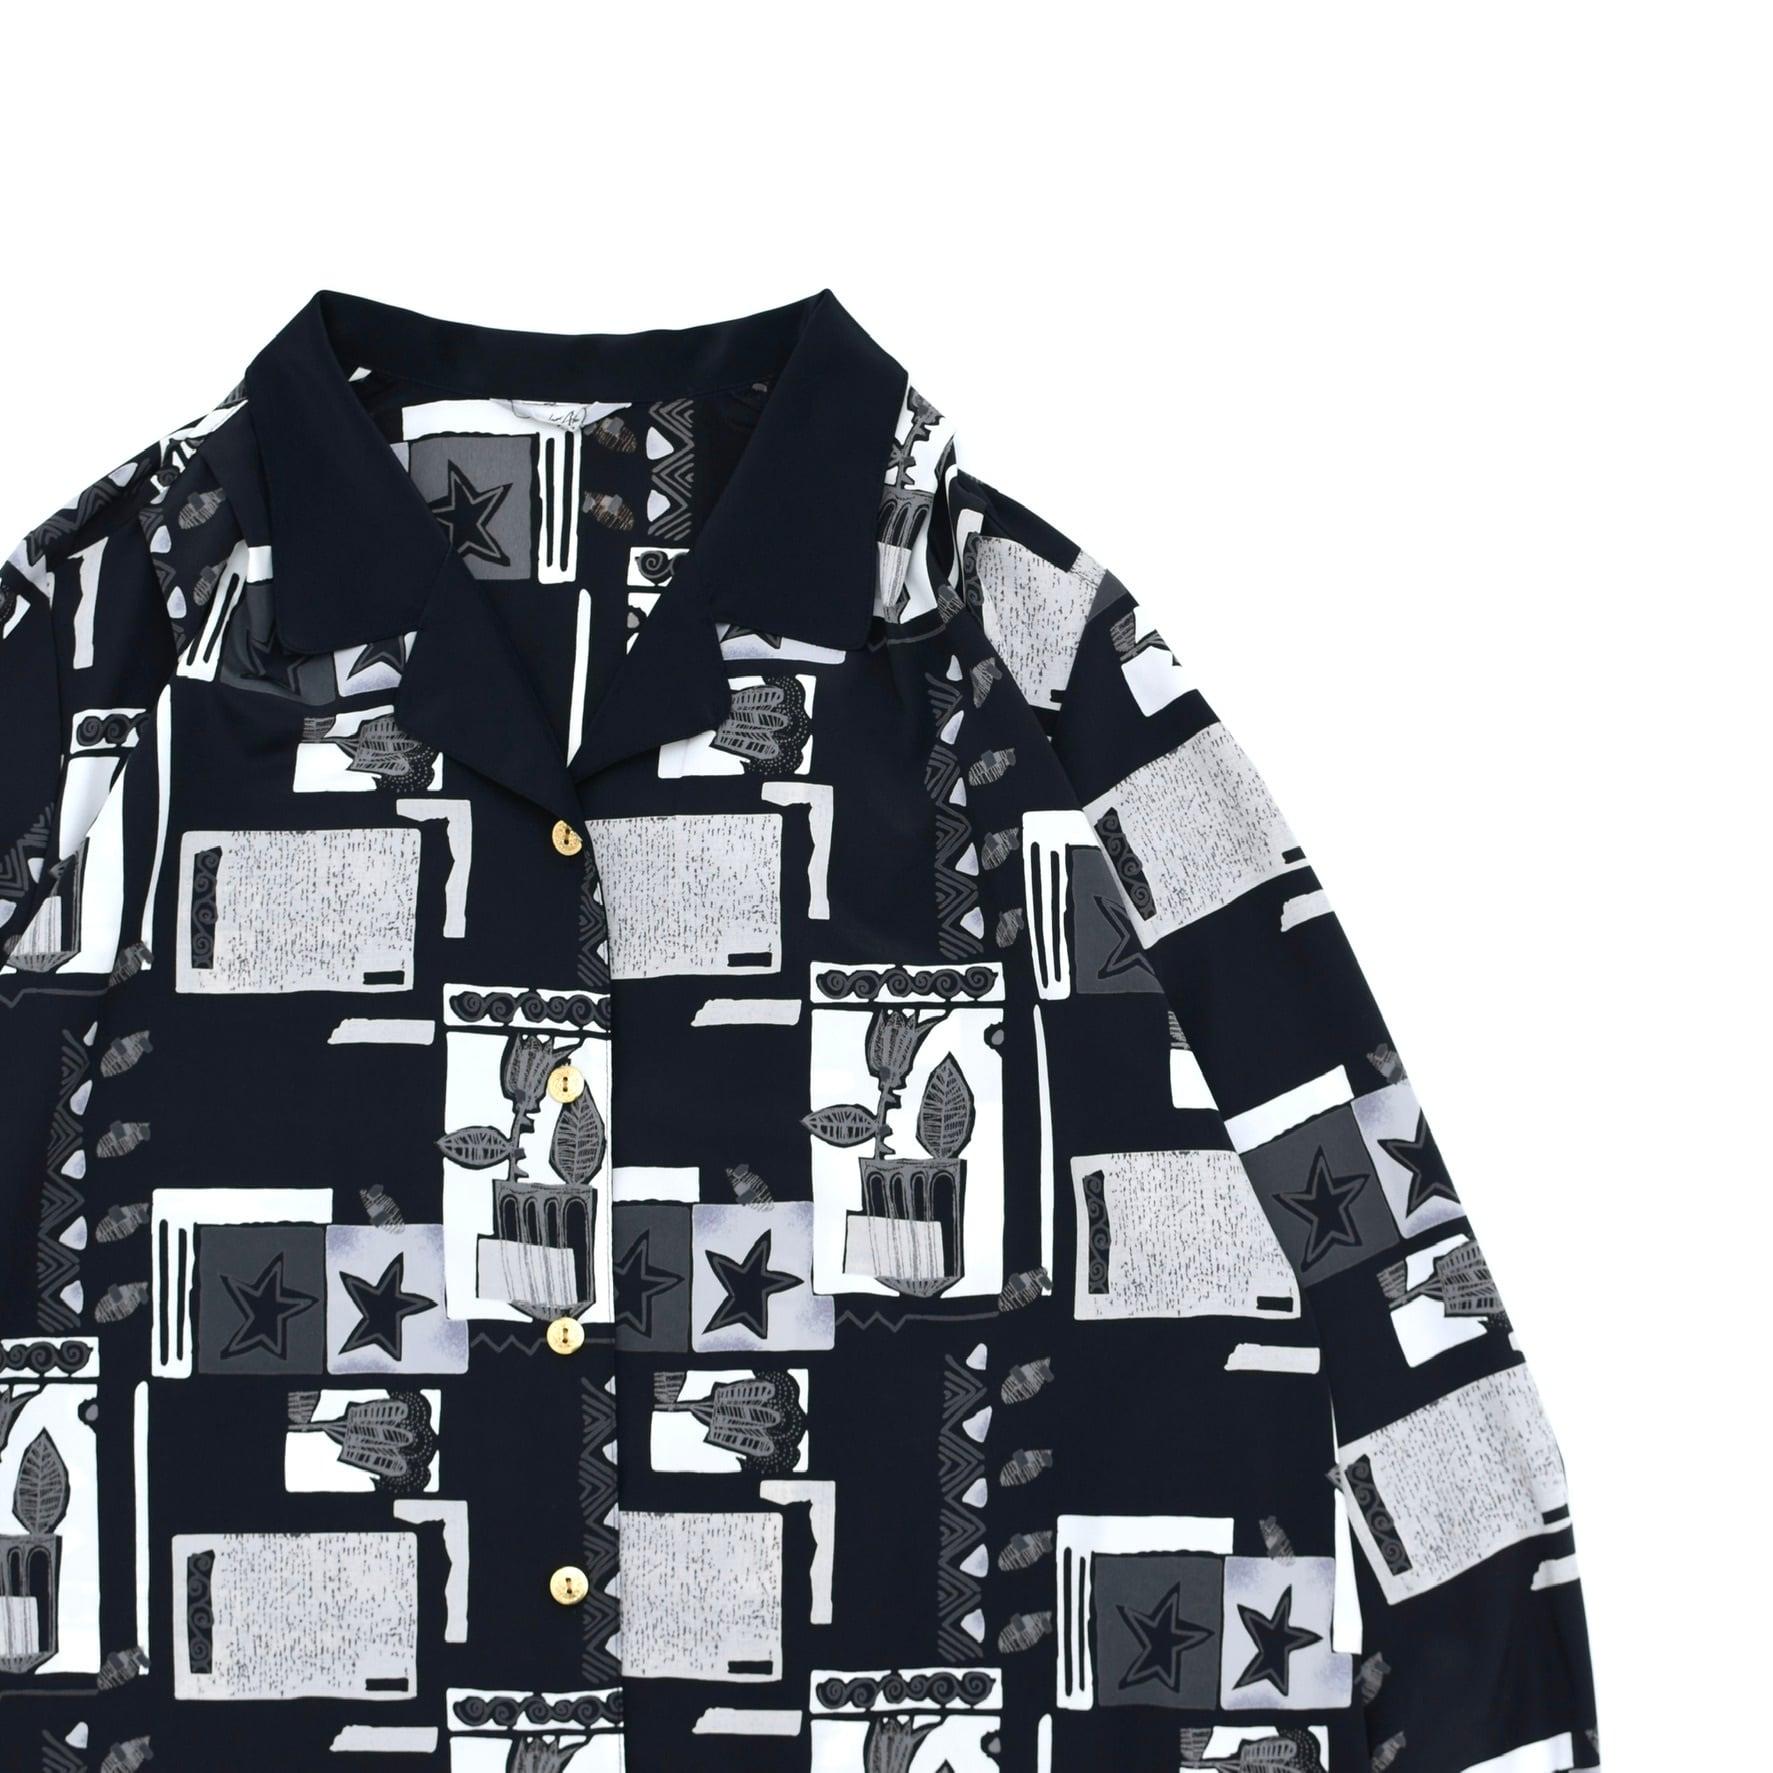 Unisex Monotone open collar design shirt